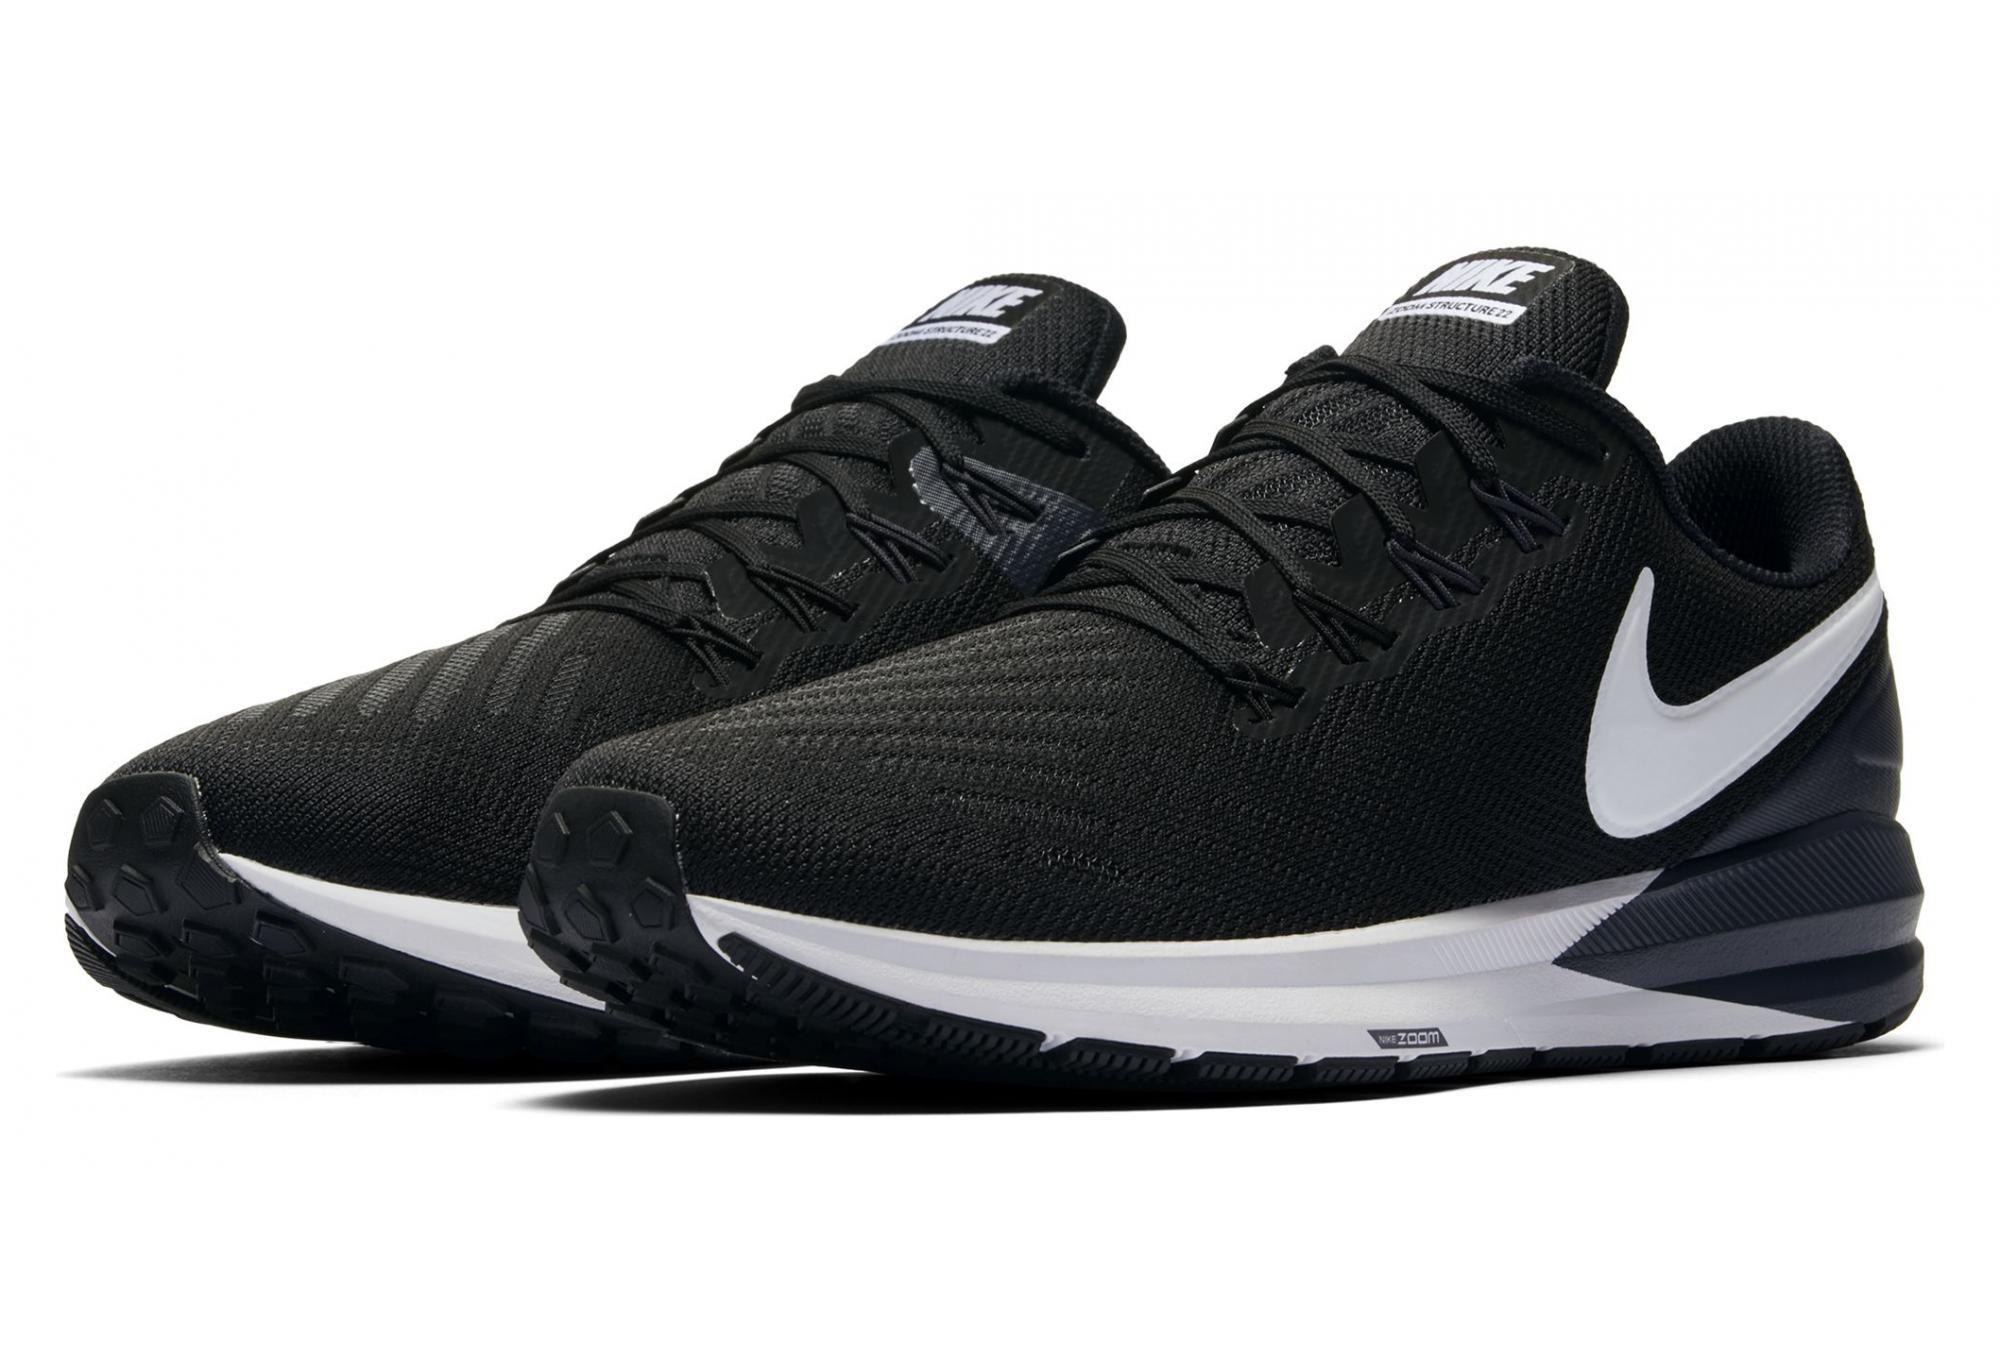 Nike Air Zoom Structure 22 Noir Blanc Homme